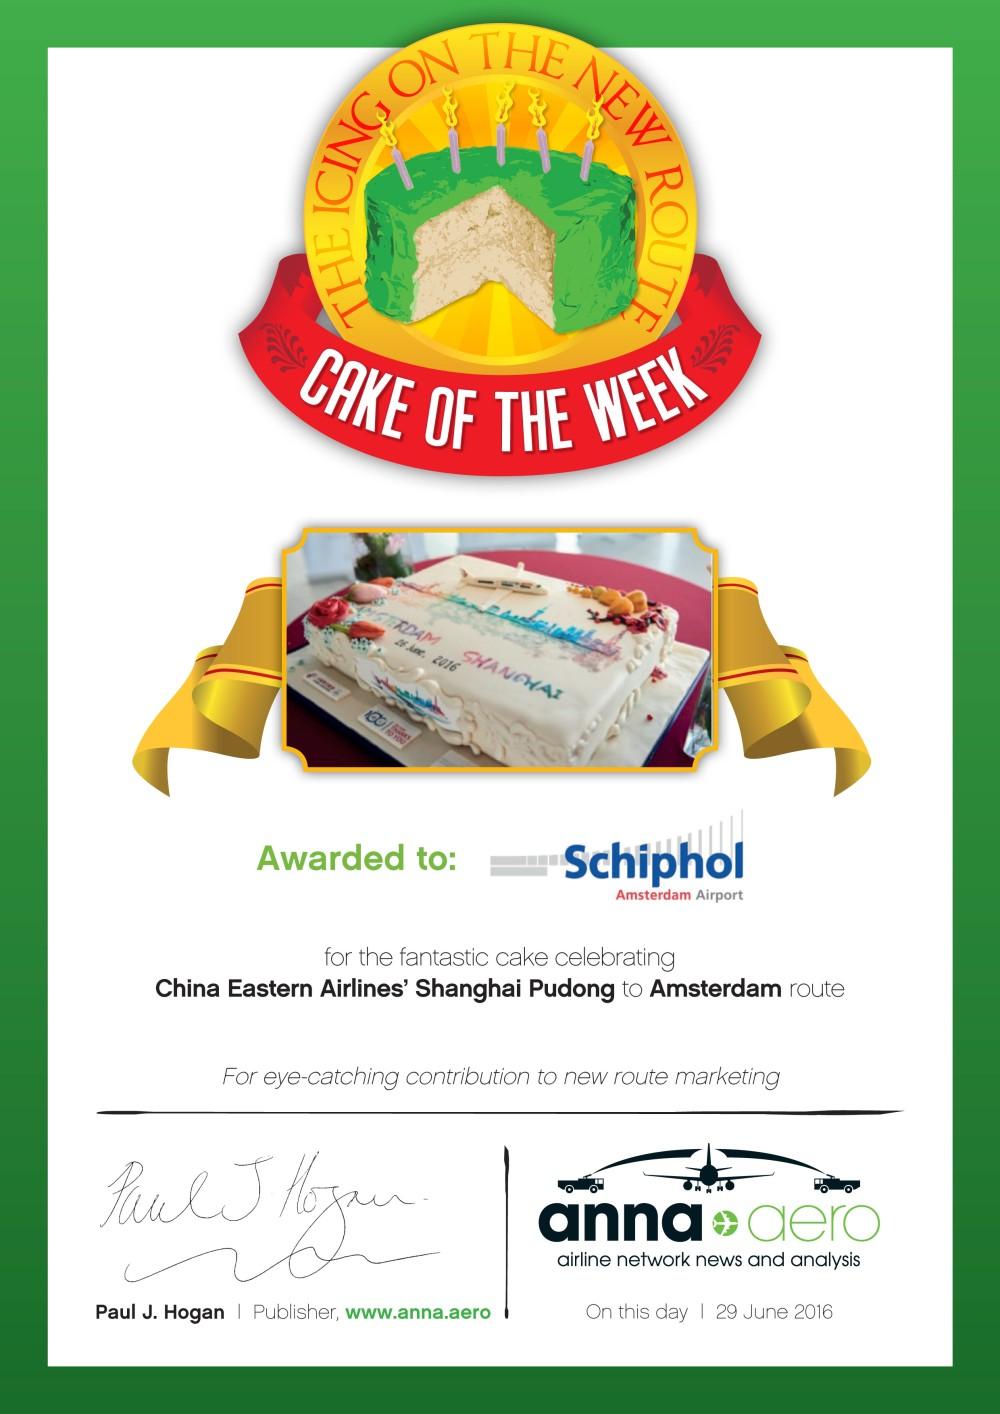 Cake-of-the-Week-certificate-(2)